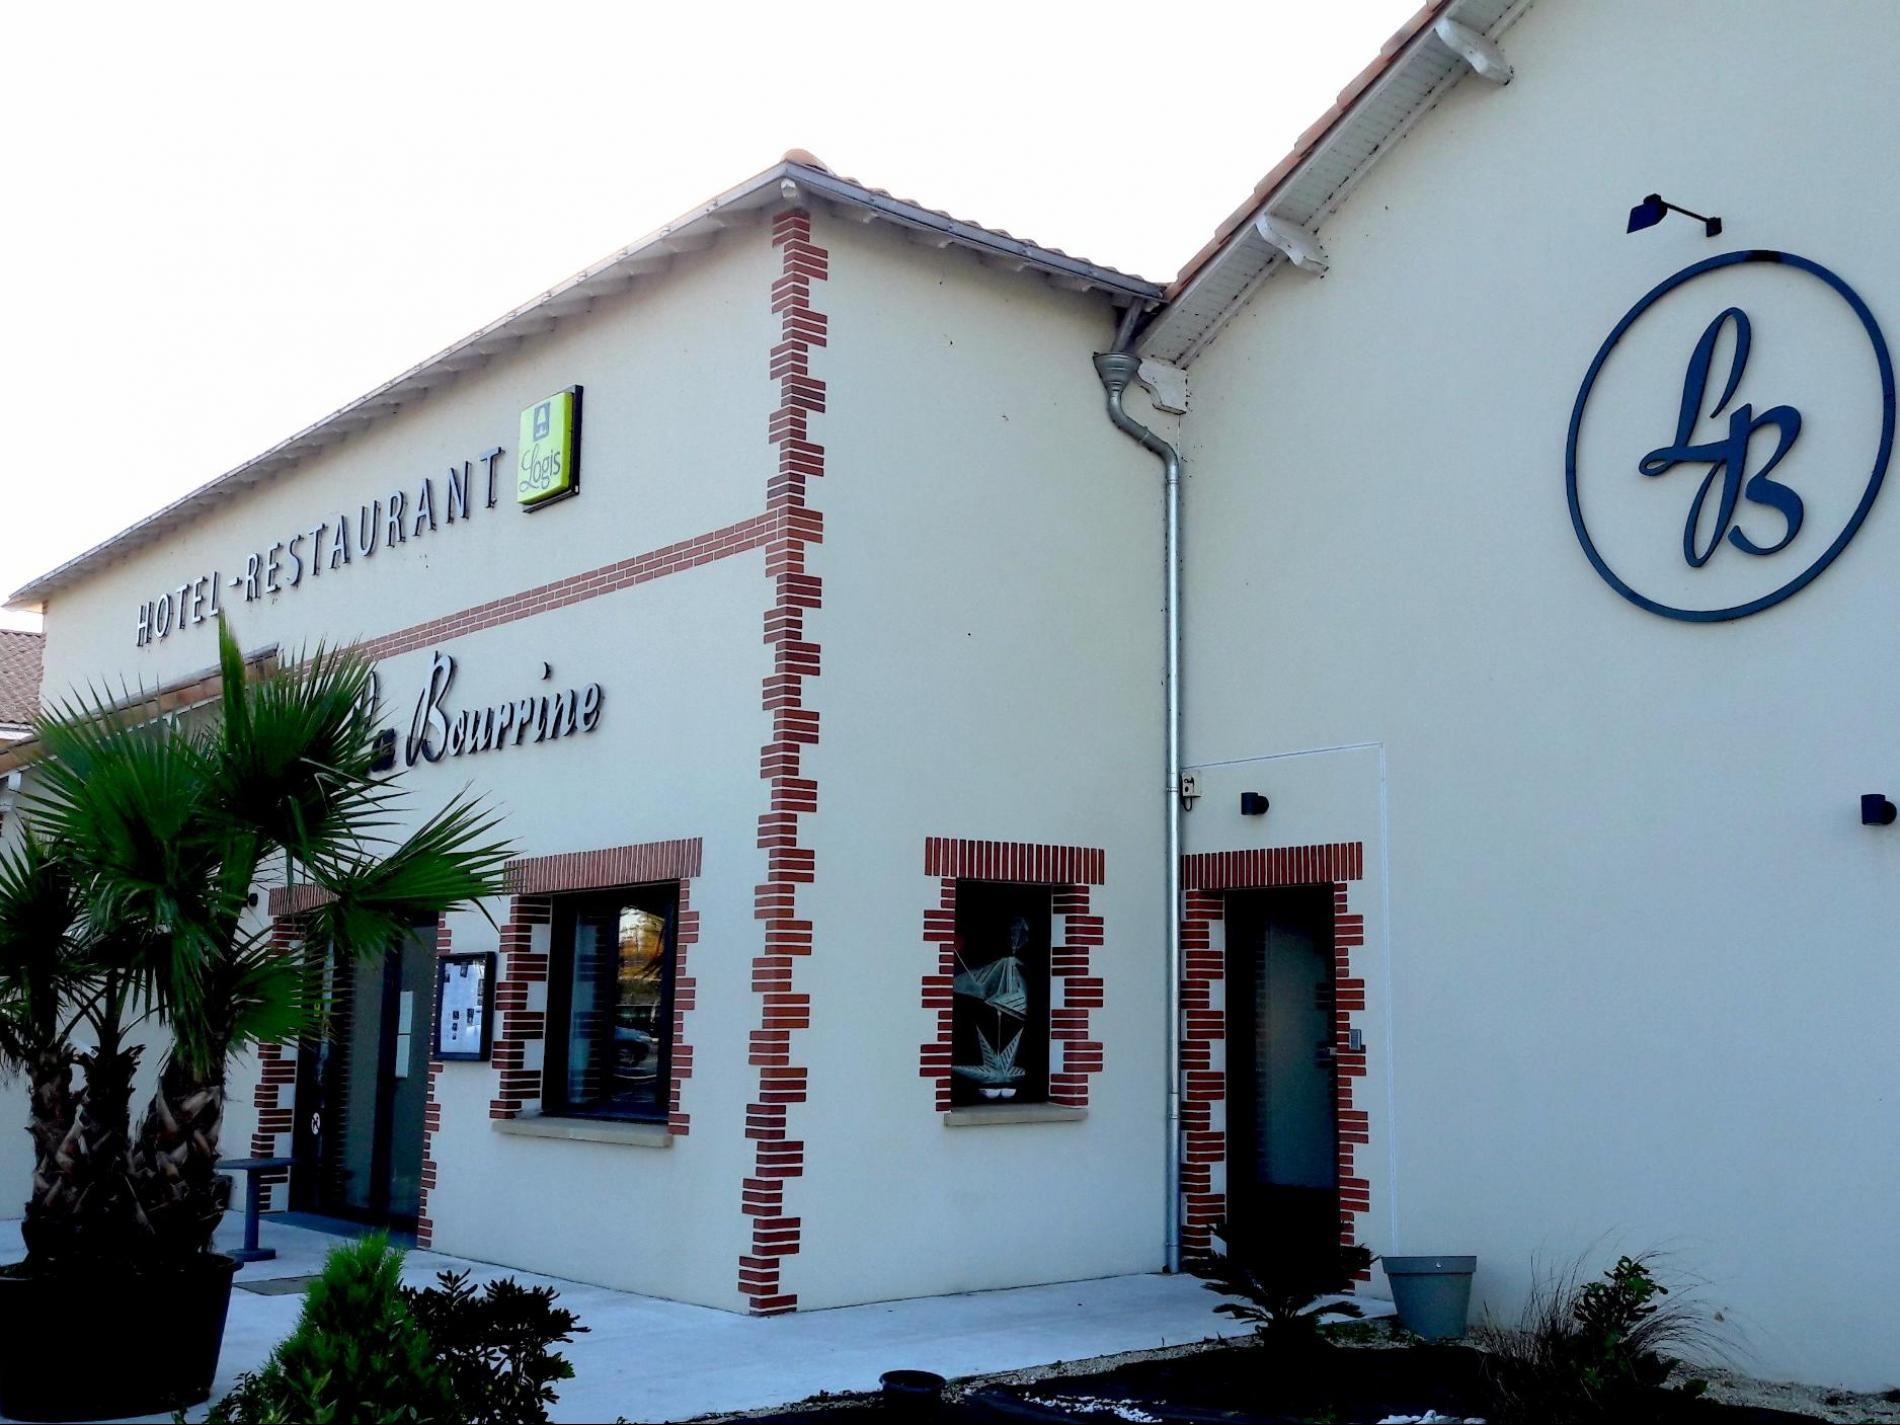 Hôtel Restaurant Bourgneuf, Hôtel Restaurant Villeneuve en Retz, Hôtel Bourgneuf, Hôtel Villeneuve en Retz, Restaurant Bourgneuf, Restaurant Villeneuve, Logis de France Bourgneuf, Logis de France Pornic, Logis de France Villeneuve en Retz